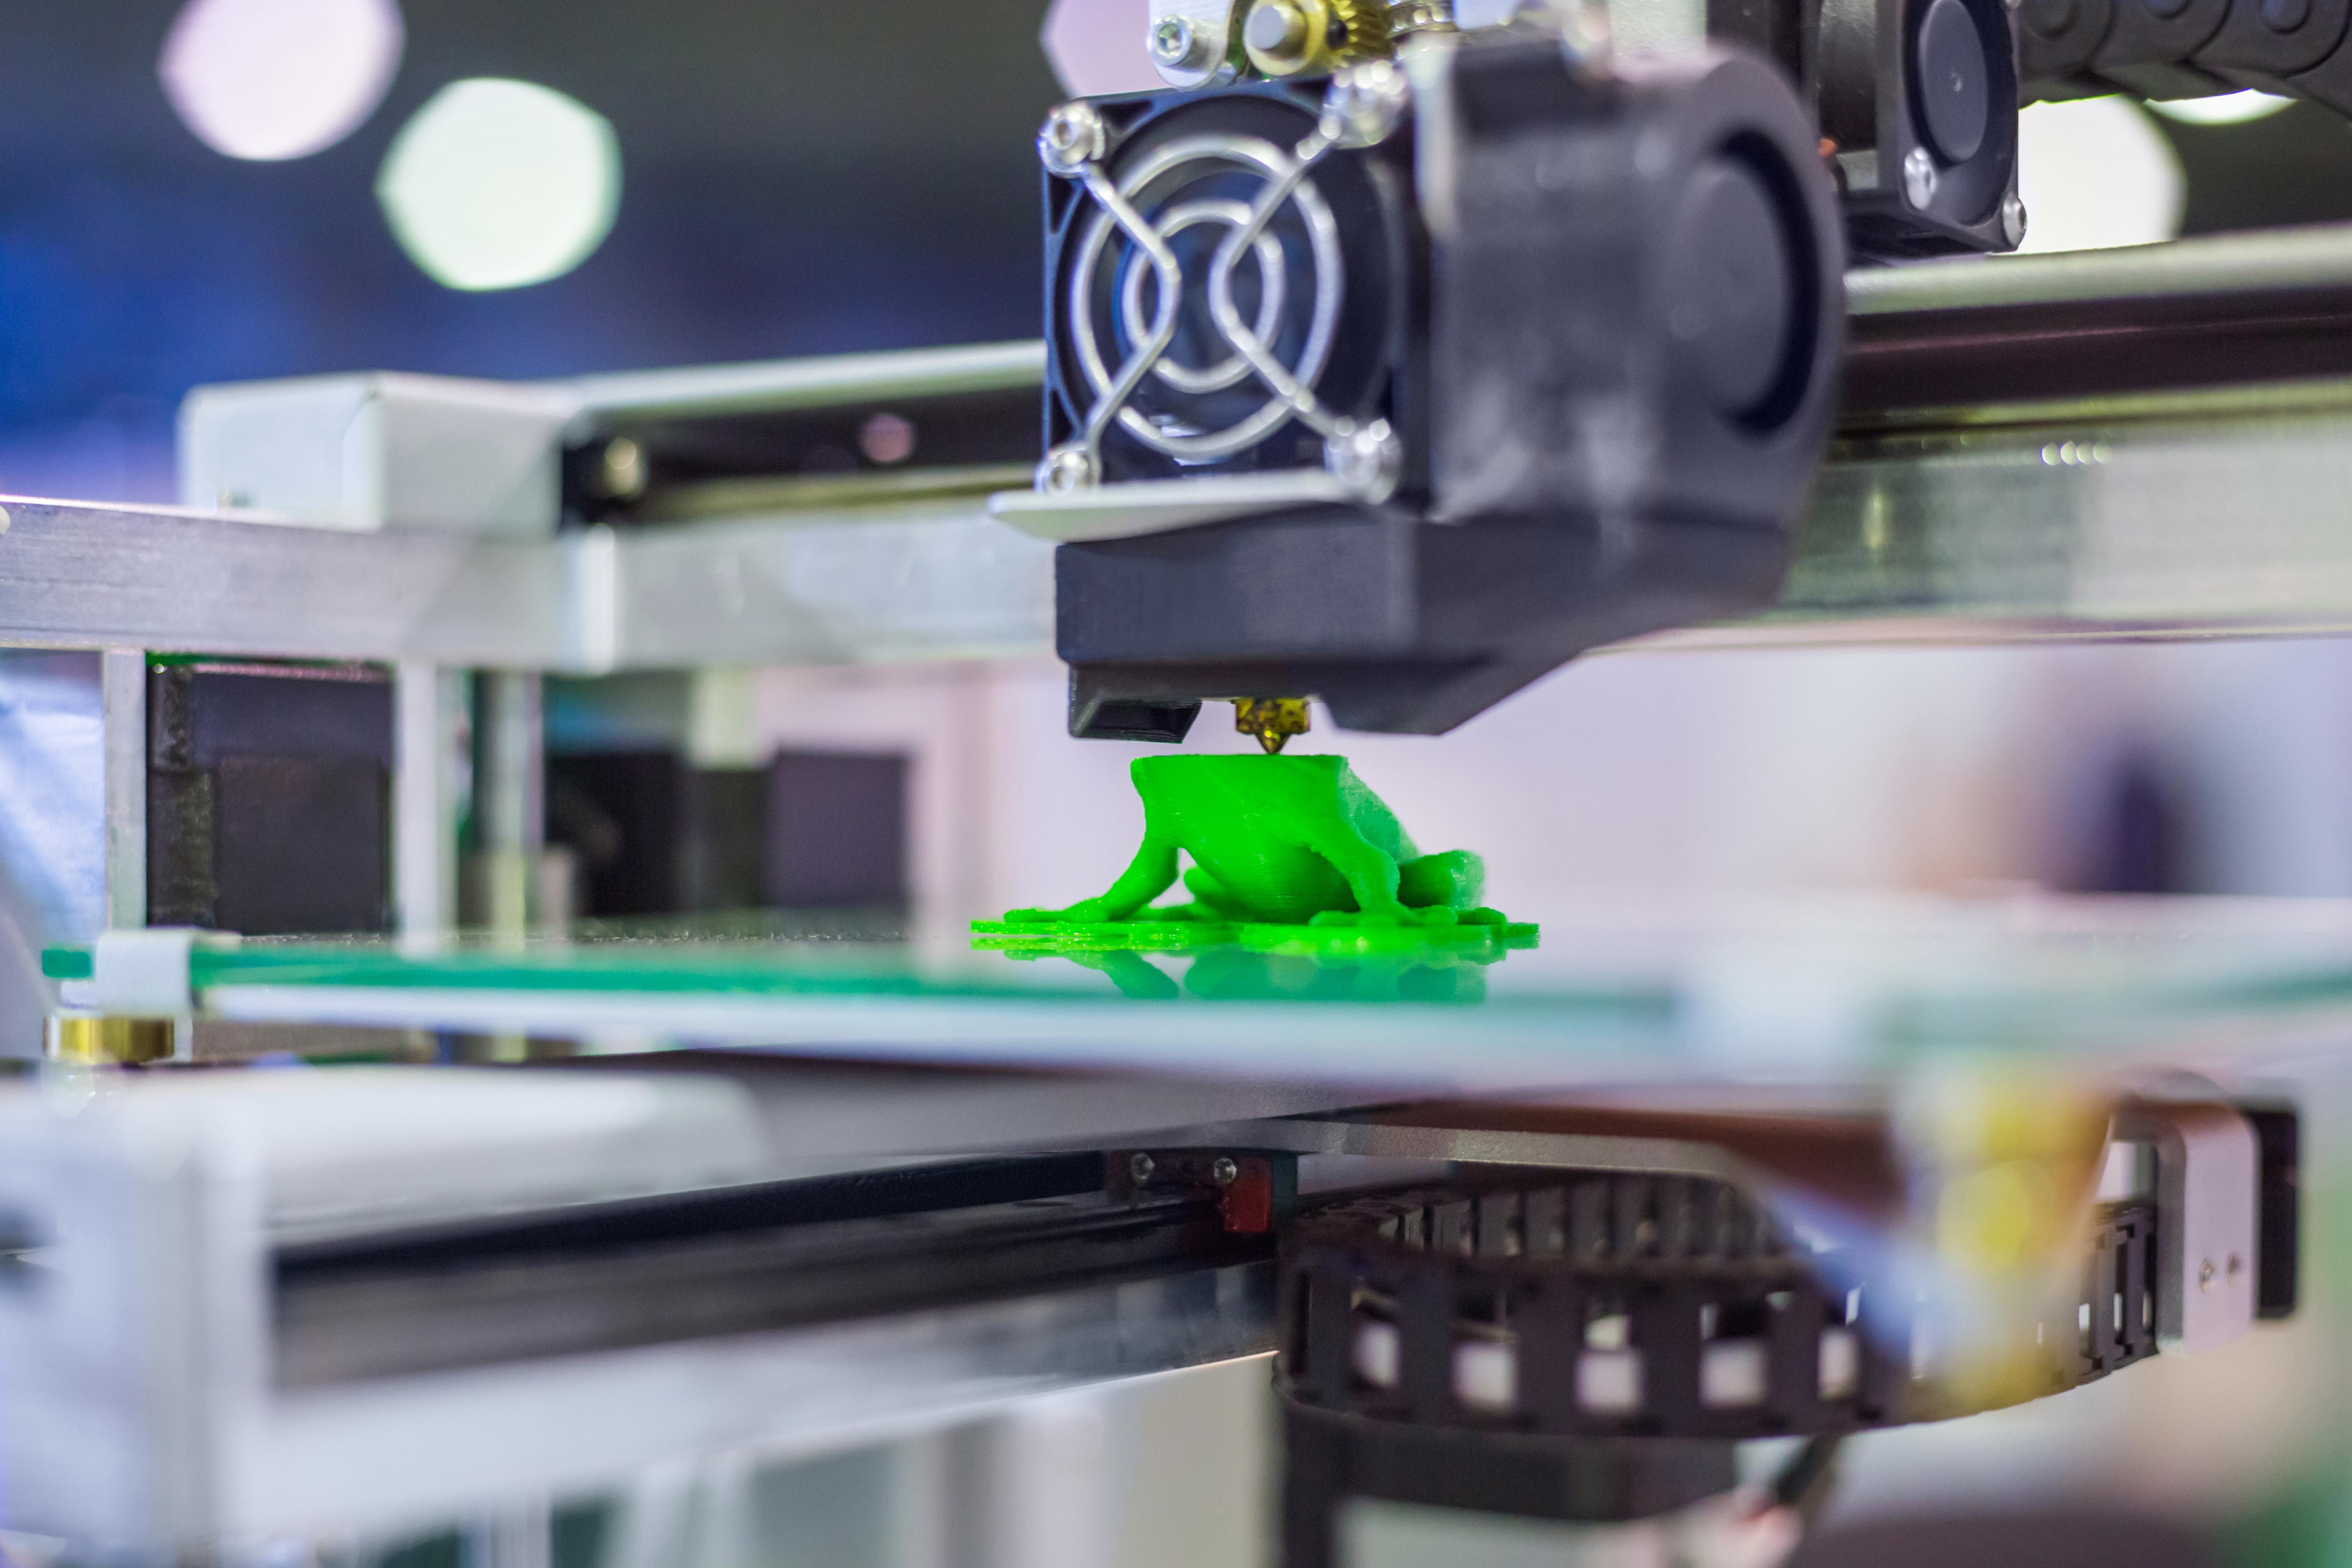 A 3D printer printing a plastic frog